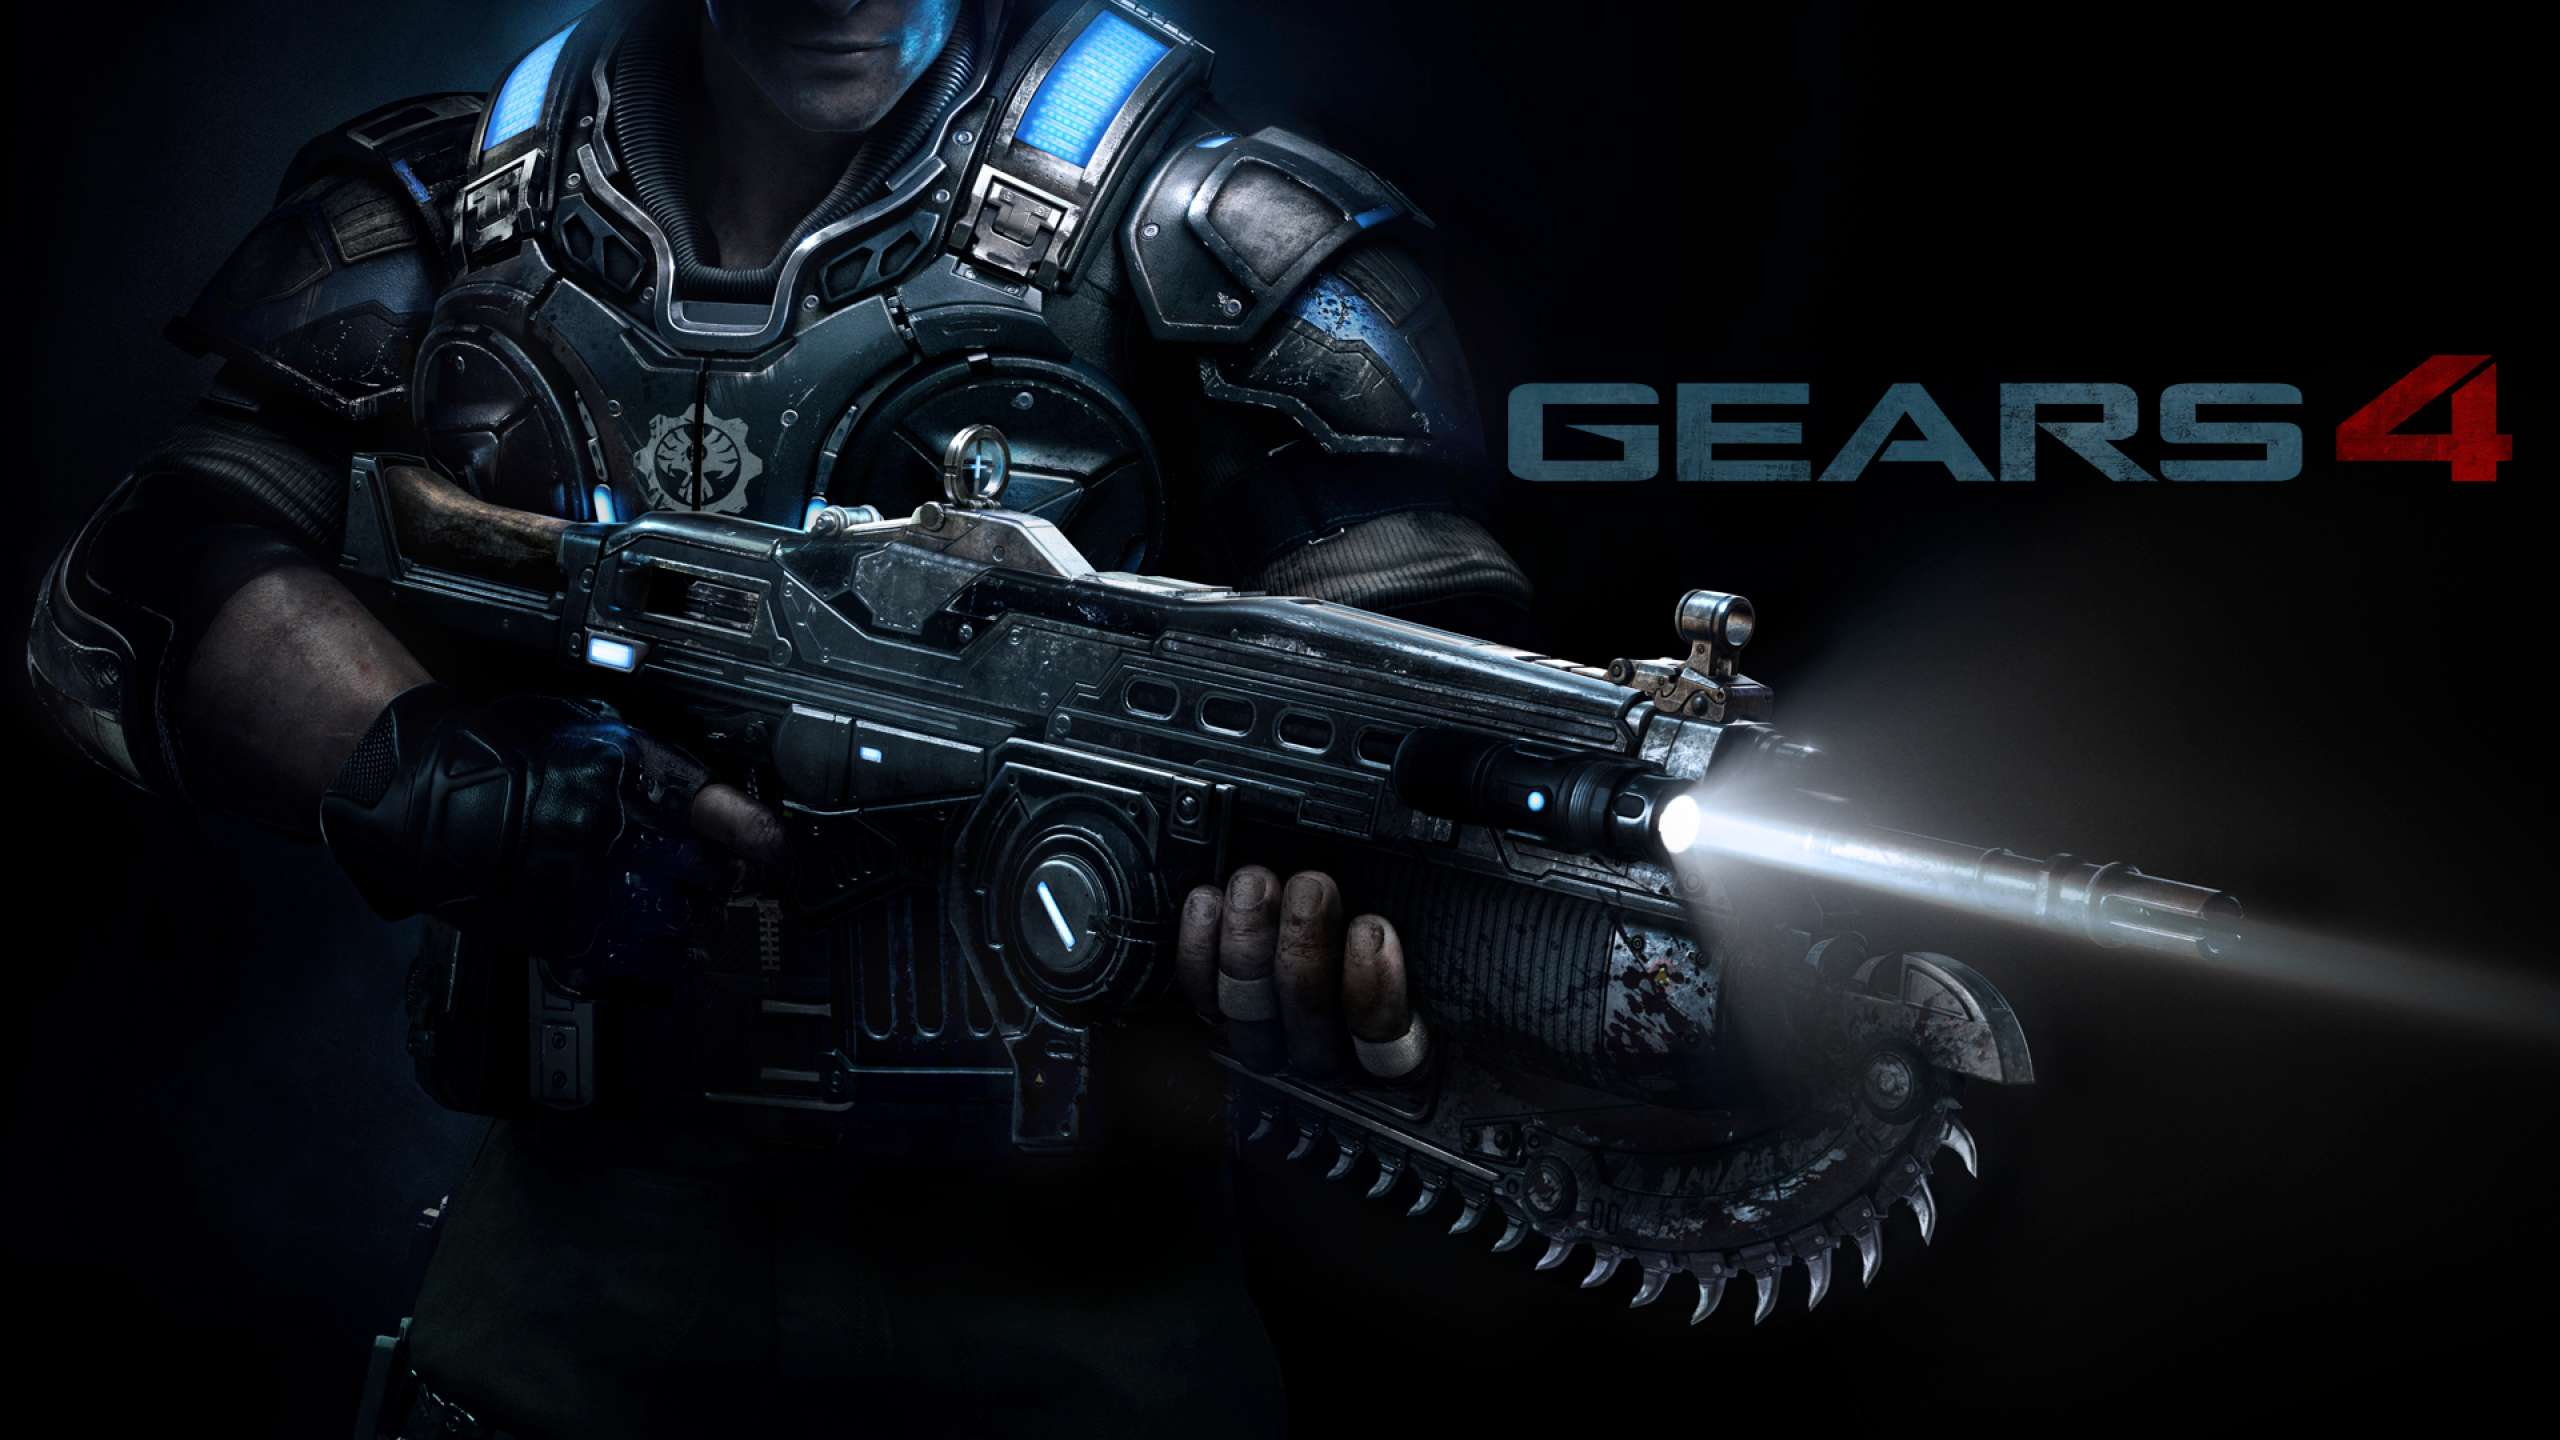 Gears of War 4 sortira le 11 octobre 2016 ! Deskto10